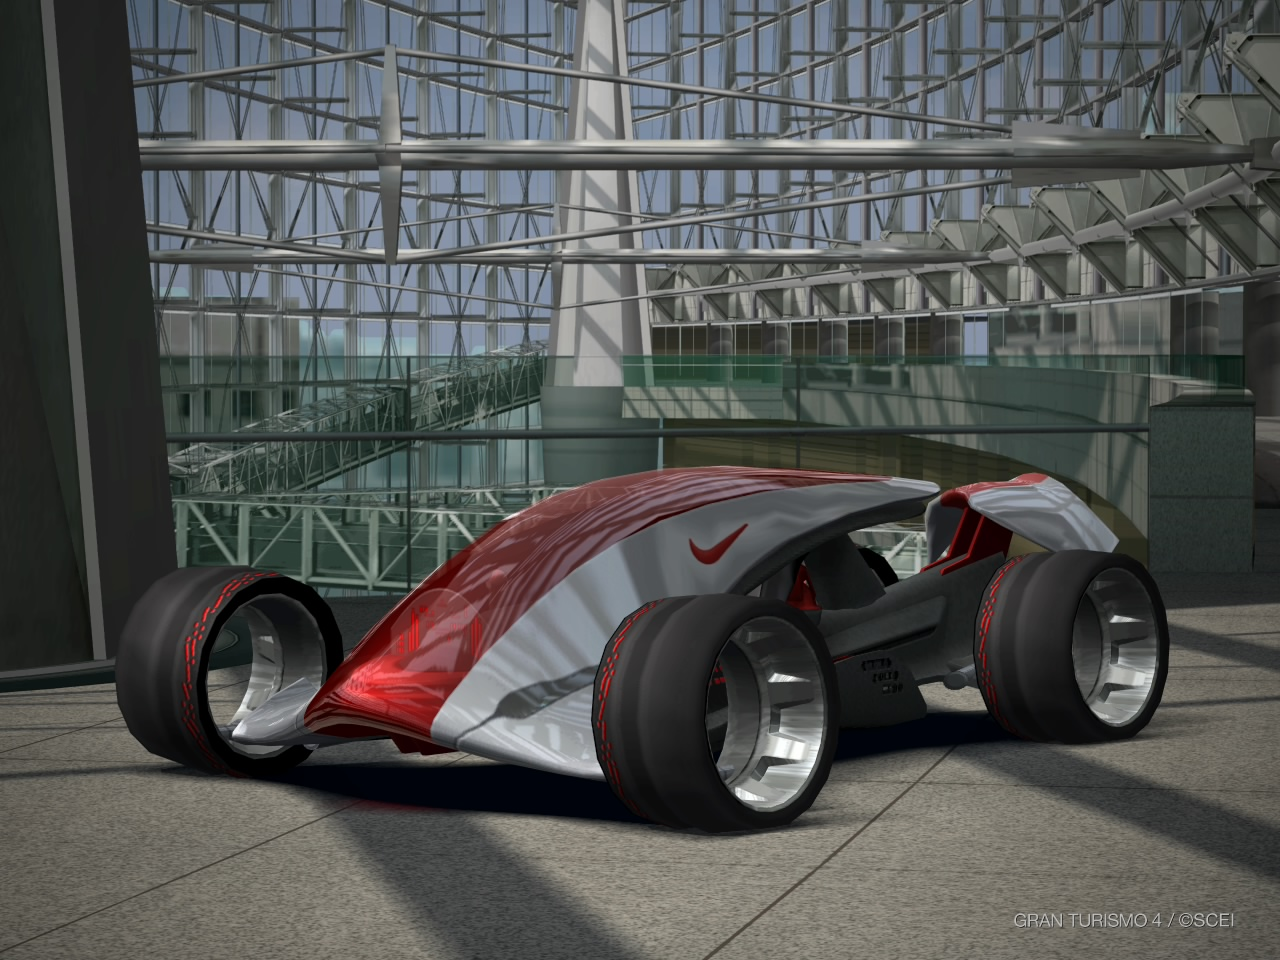 Gran Turismo 4 Nike one at Marunouchi 1